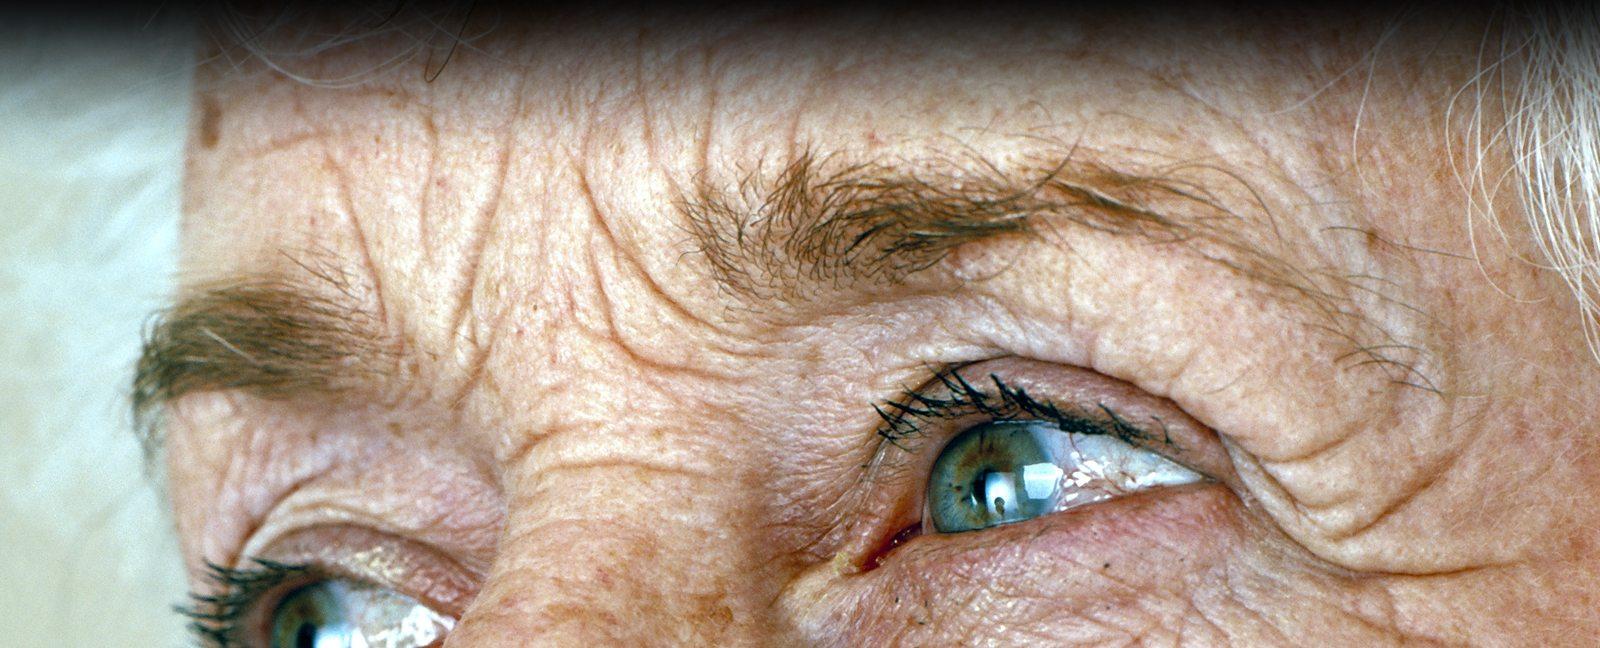 Tokeo la picha la wrinkles